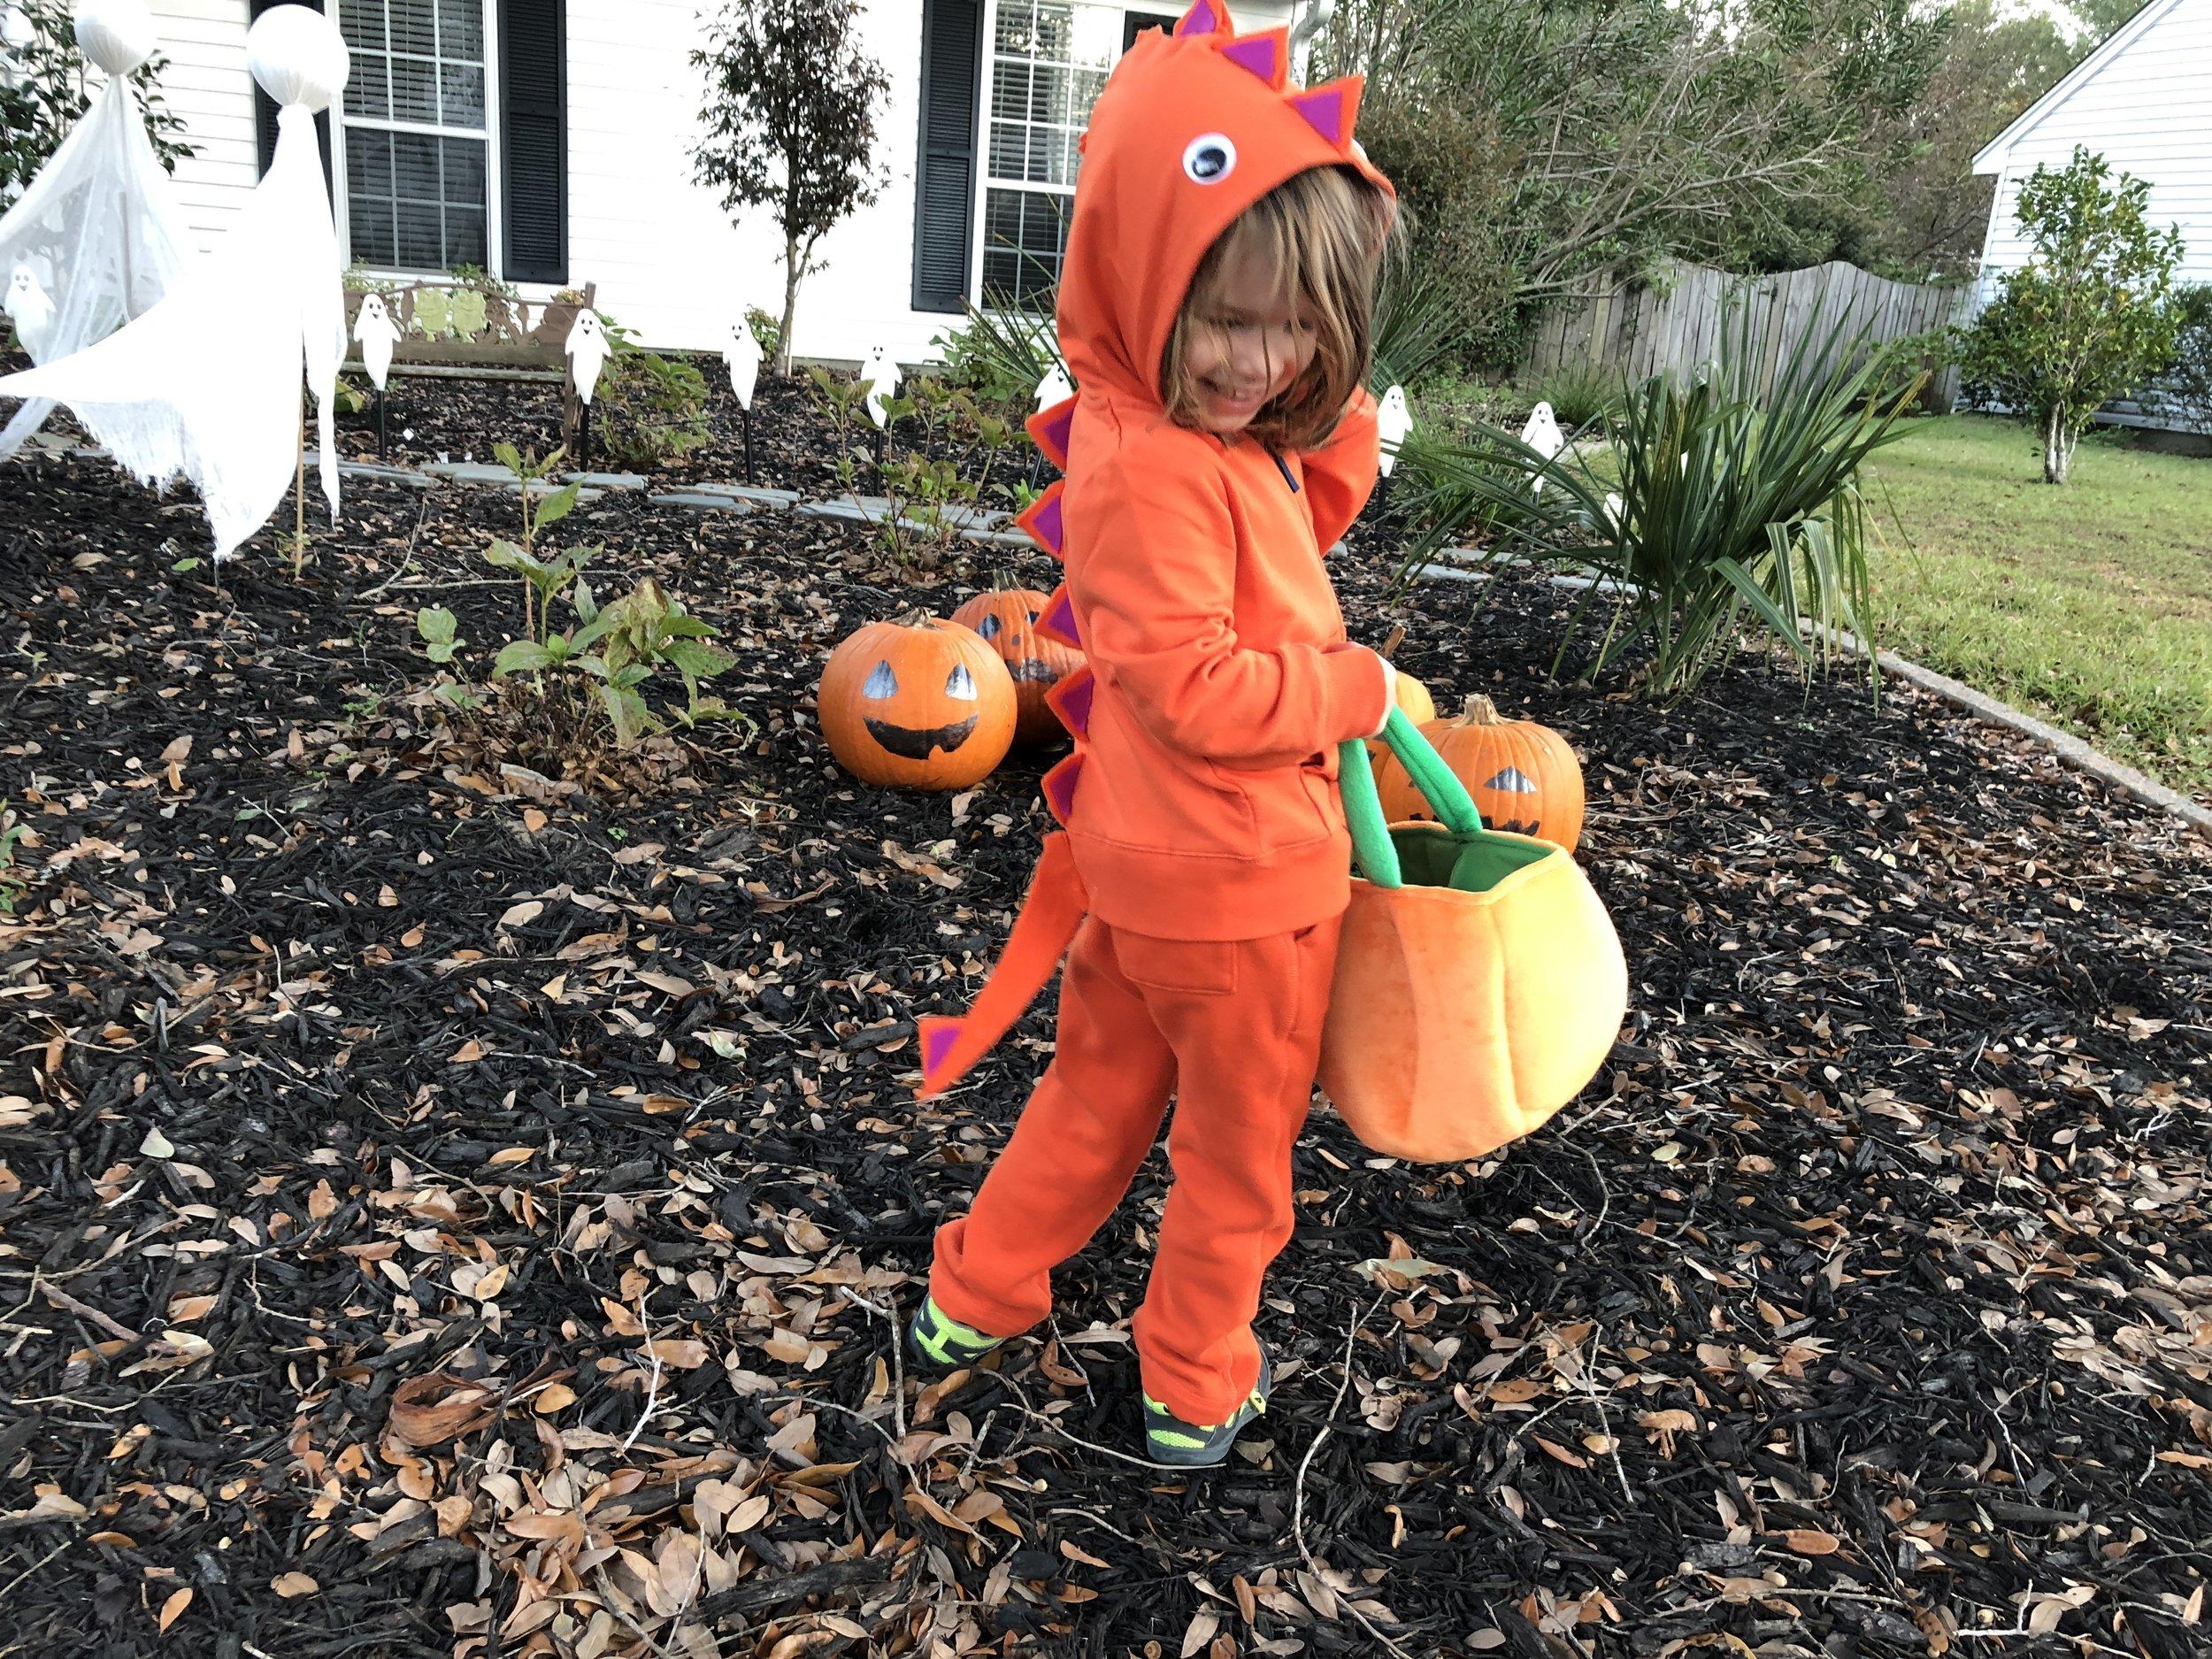 My little orange dinosaur